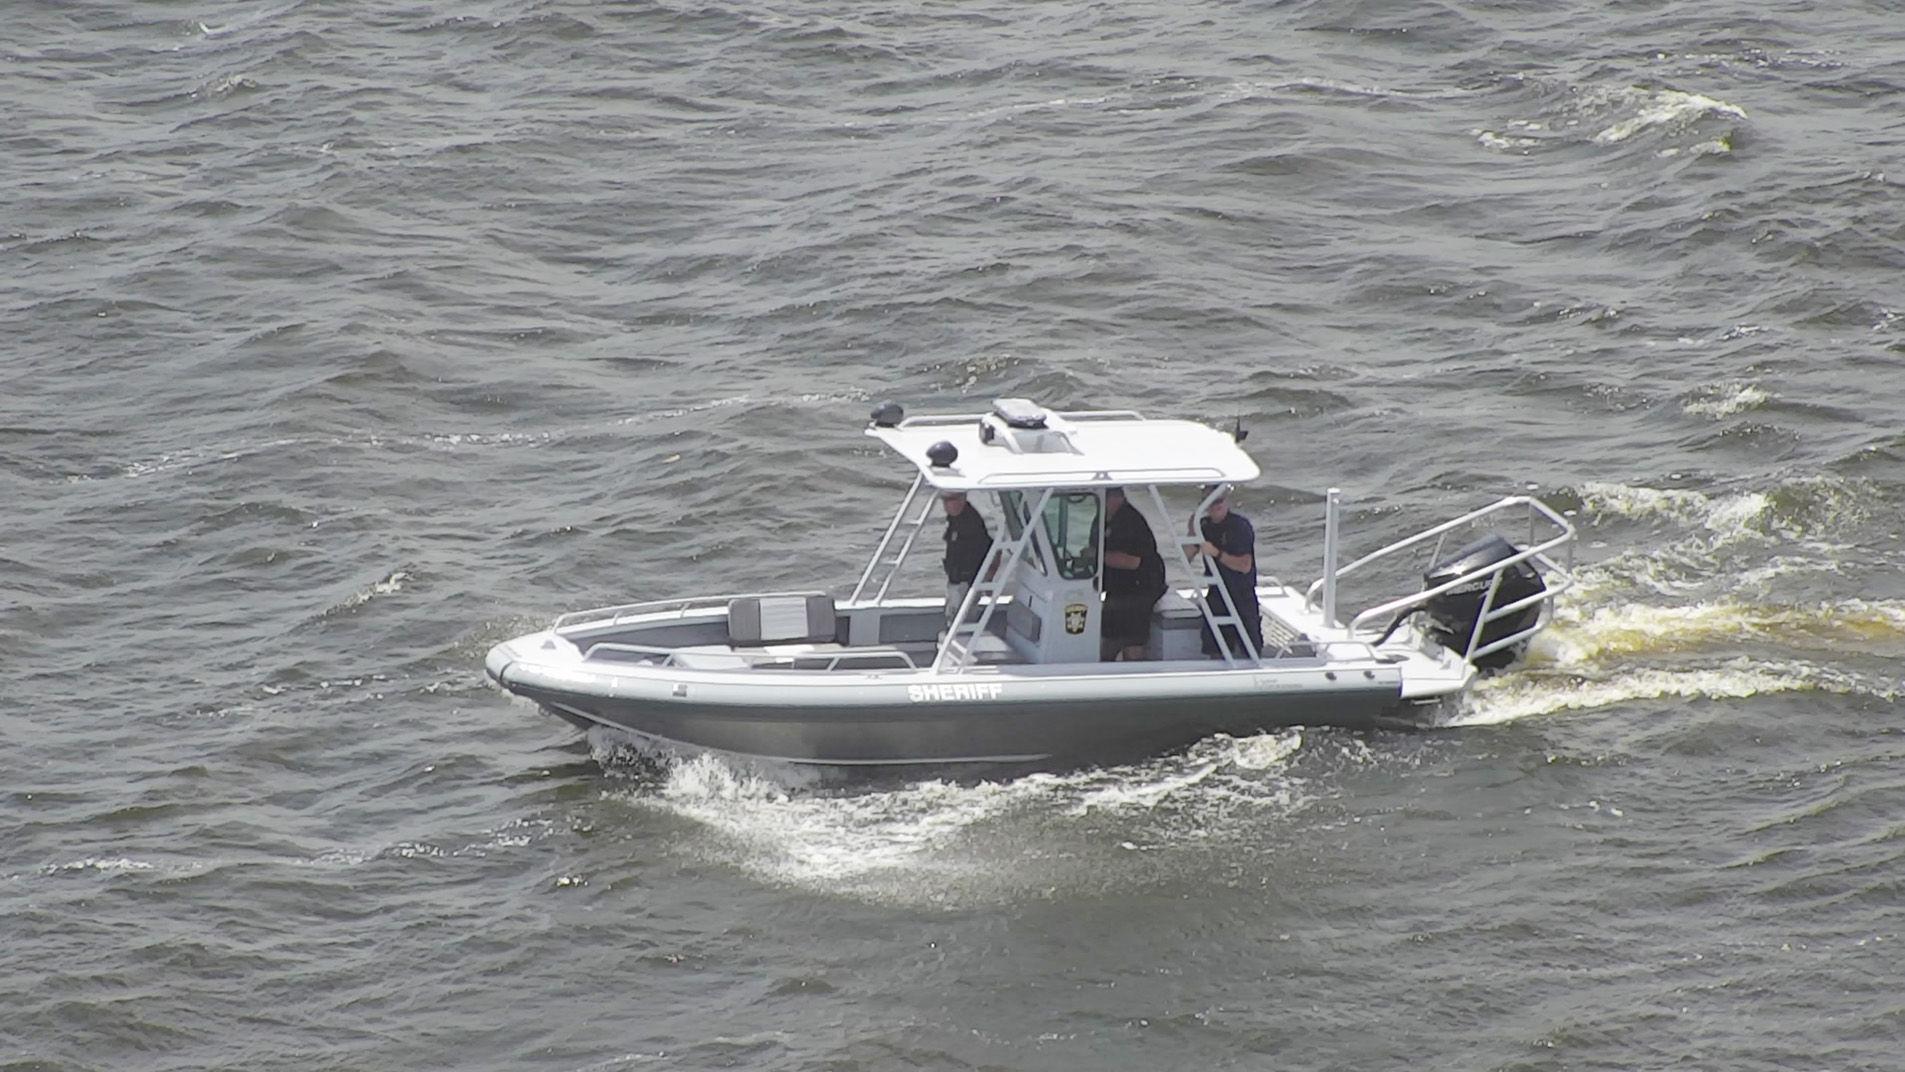 Agencies team up to increase Milford Lake water safety patrols